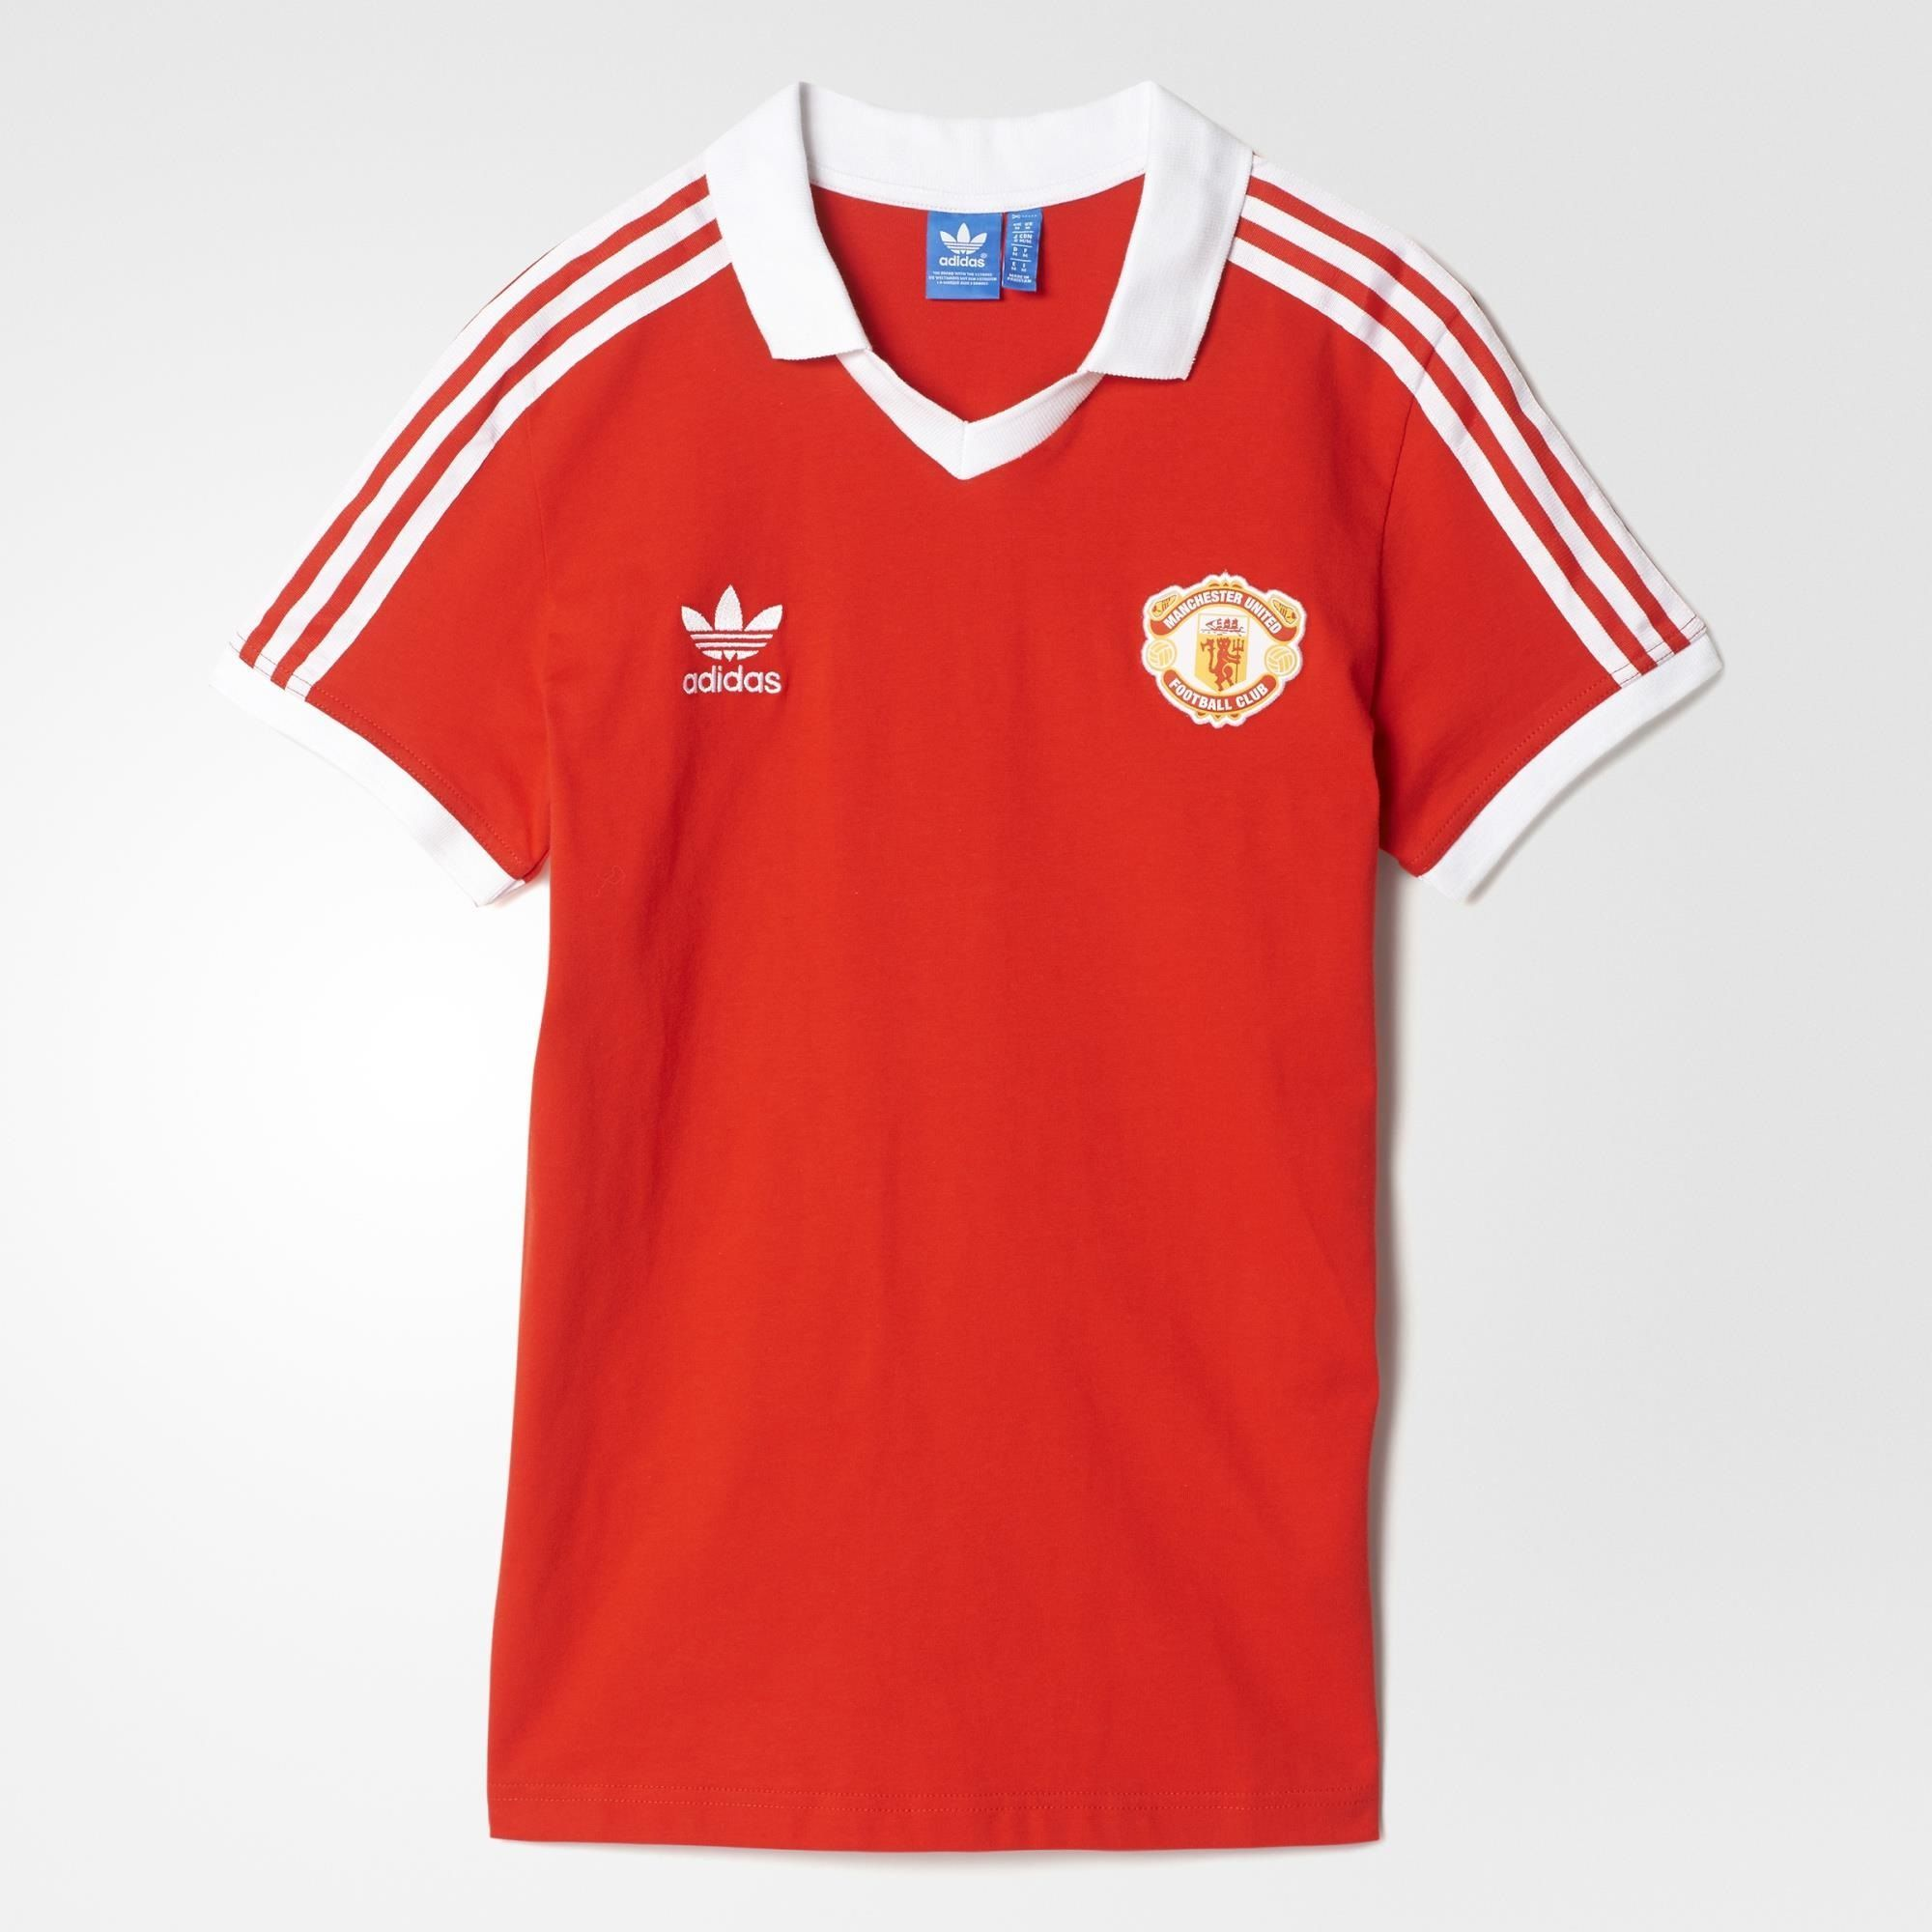 0f33e4ccf79 Manchester United retro jersey. adidas Originals.  65